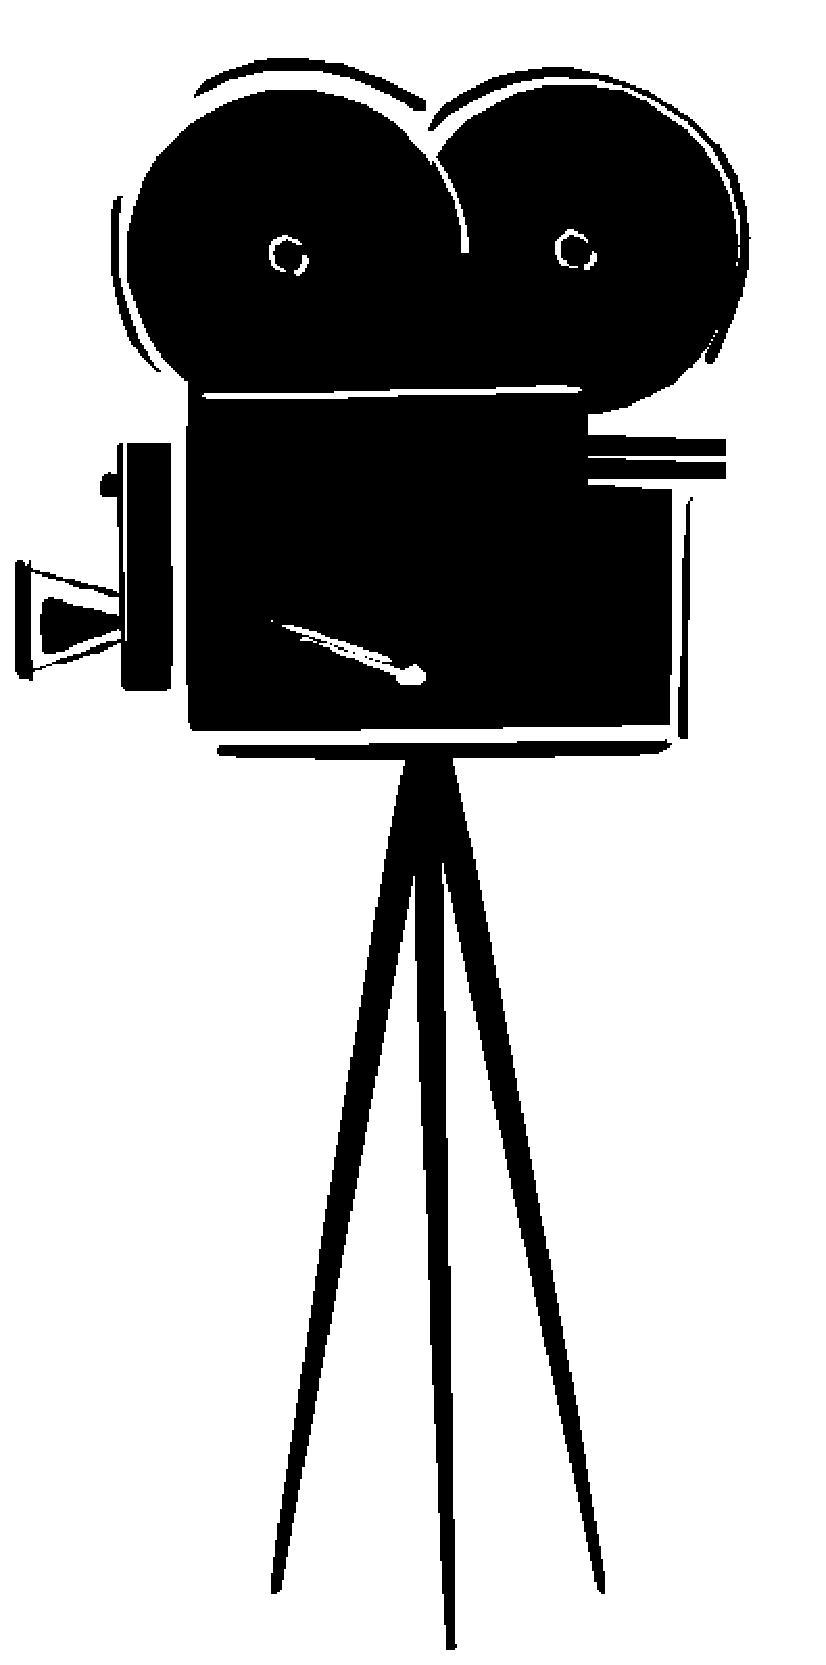 Movie camera clip art 4-Movie camera clip art 4-7